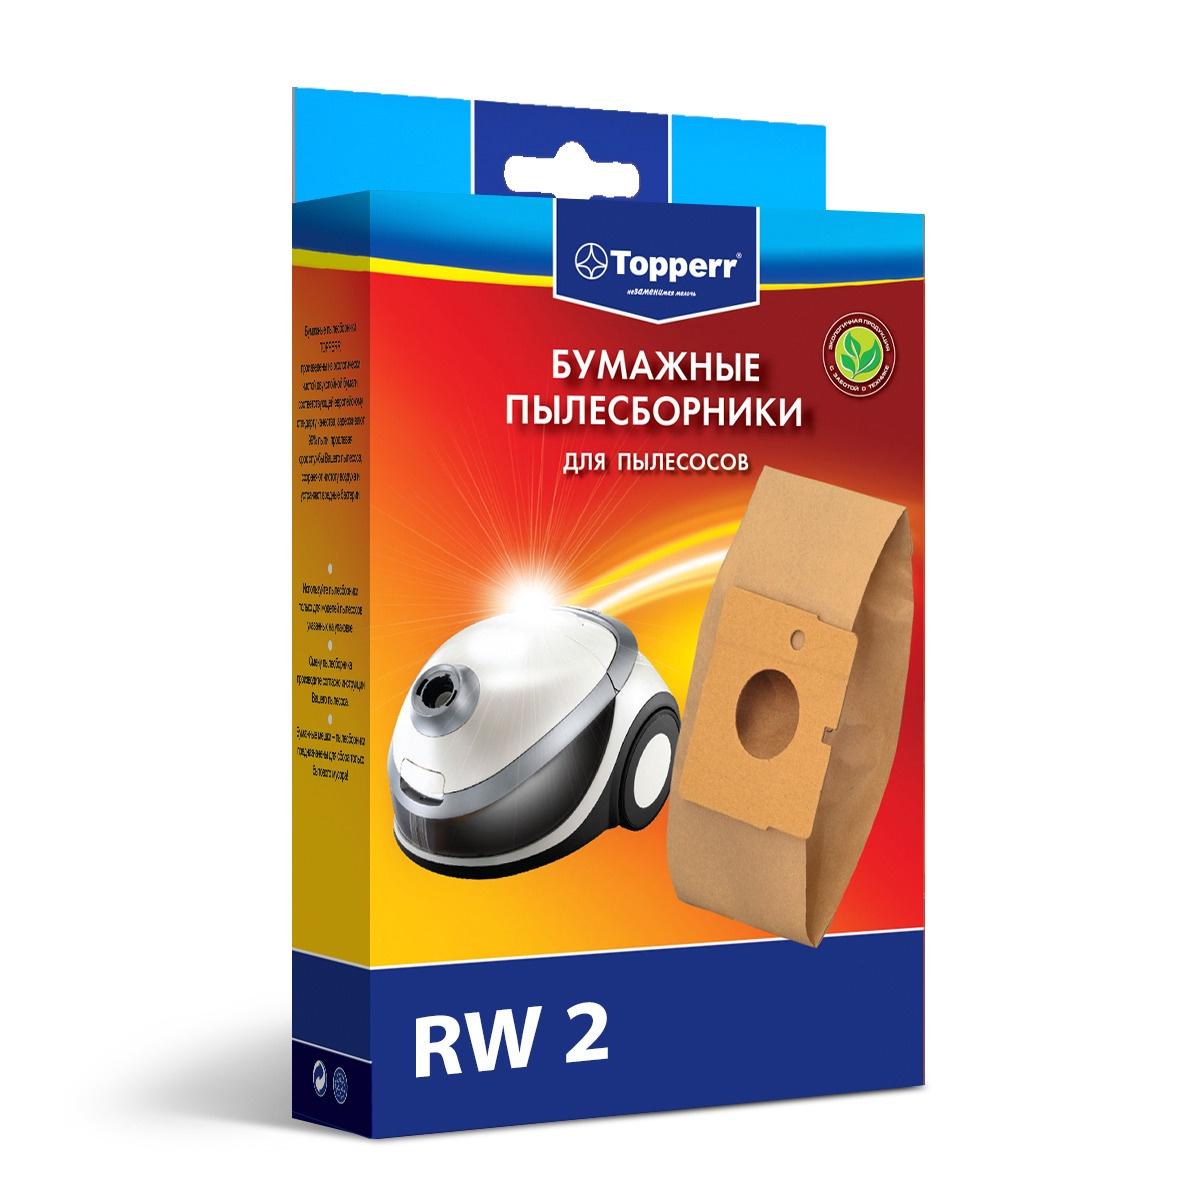 Пылесборник Topperr Pro 1024 RW 2, для пылесоса Rowenta Dymbo, 5 шт + фильтр аксессуары для пылесоса sanyo rowenta rowenta ru101 ru10 ru101 ru100 ru382